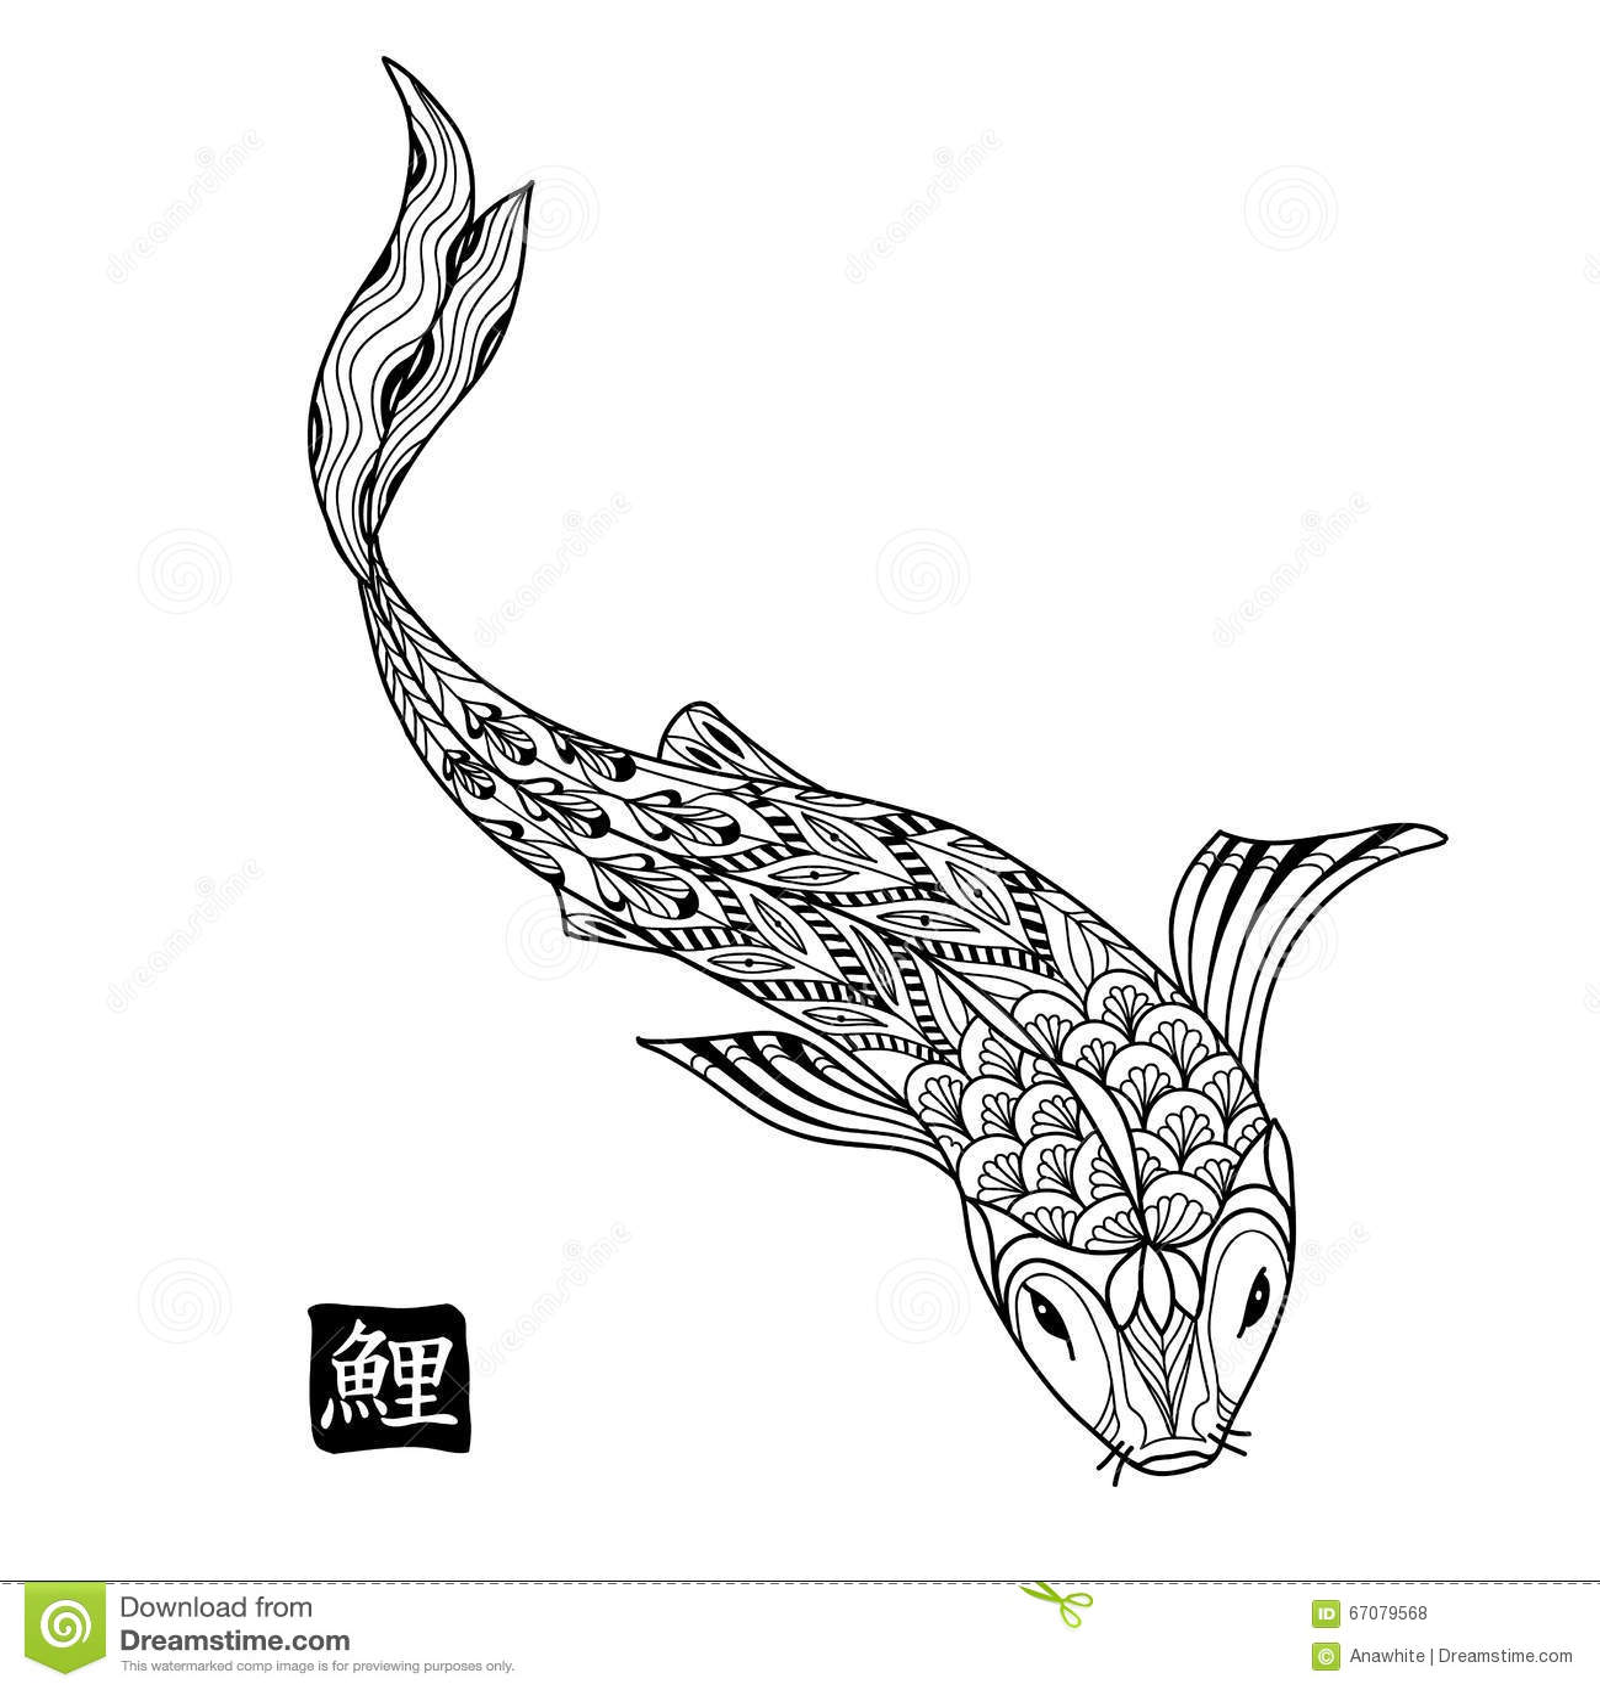 Download Hand Drawn Koi Fish Japanese Carp Line Drawing For Coloring Book Stock Vector